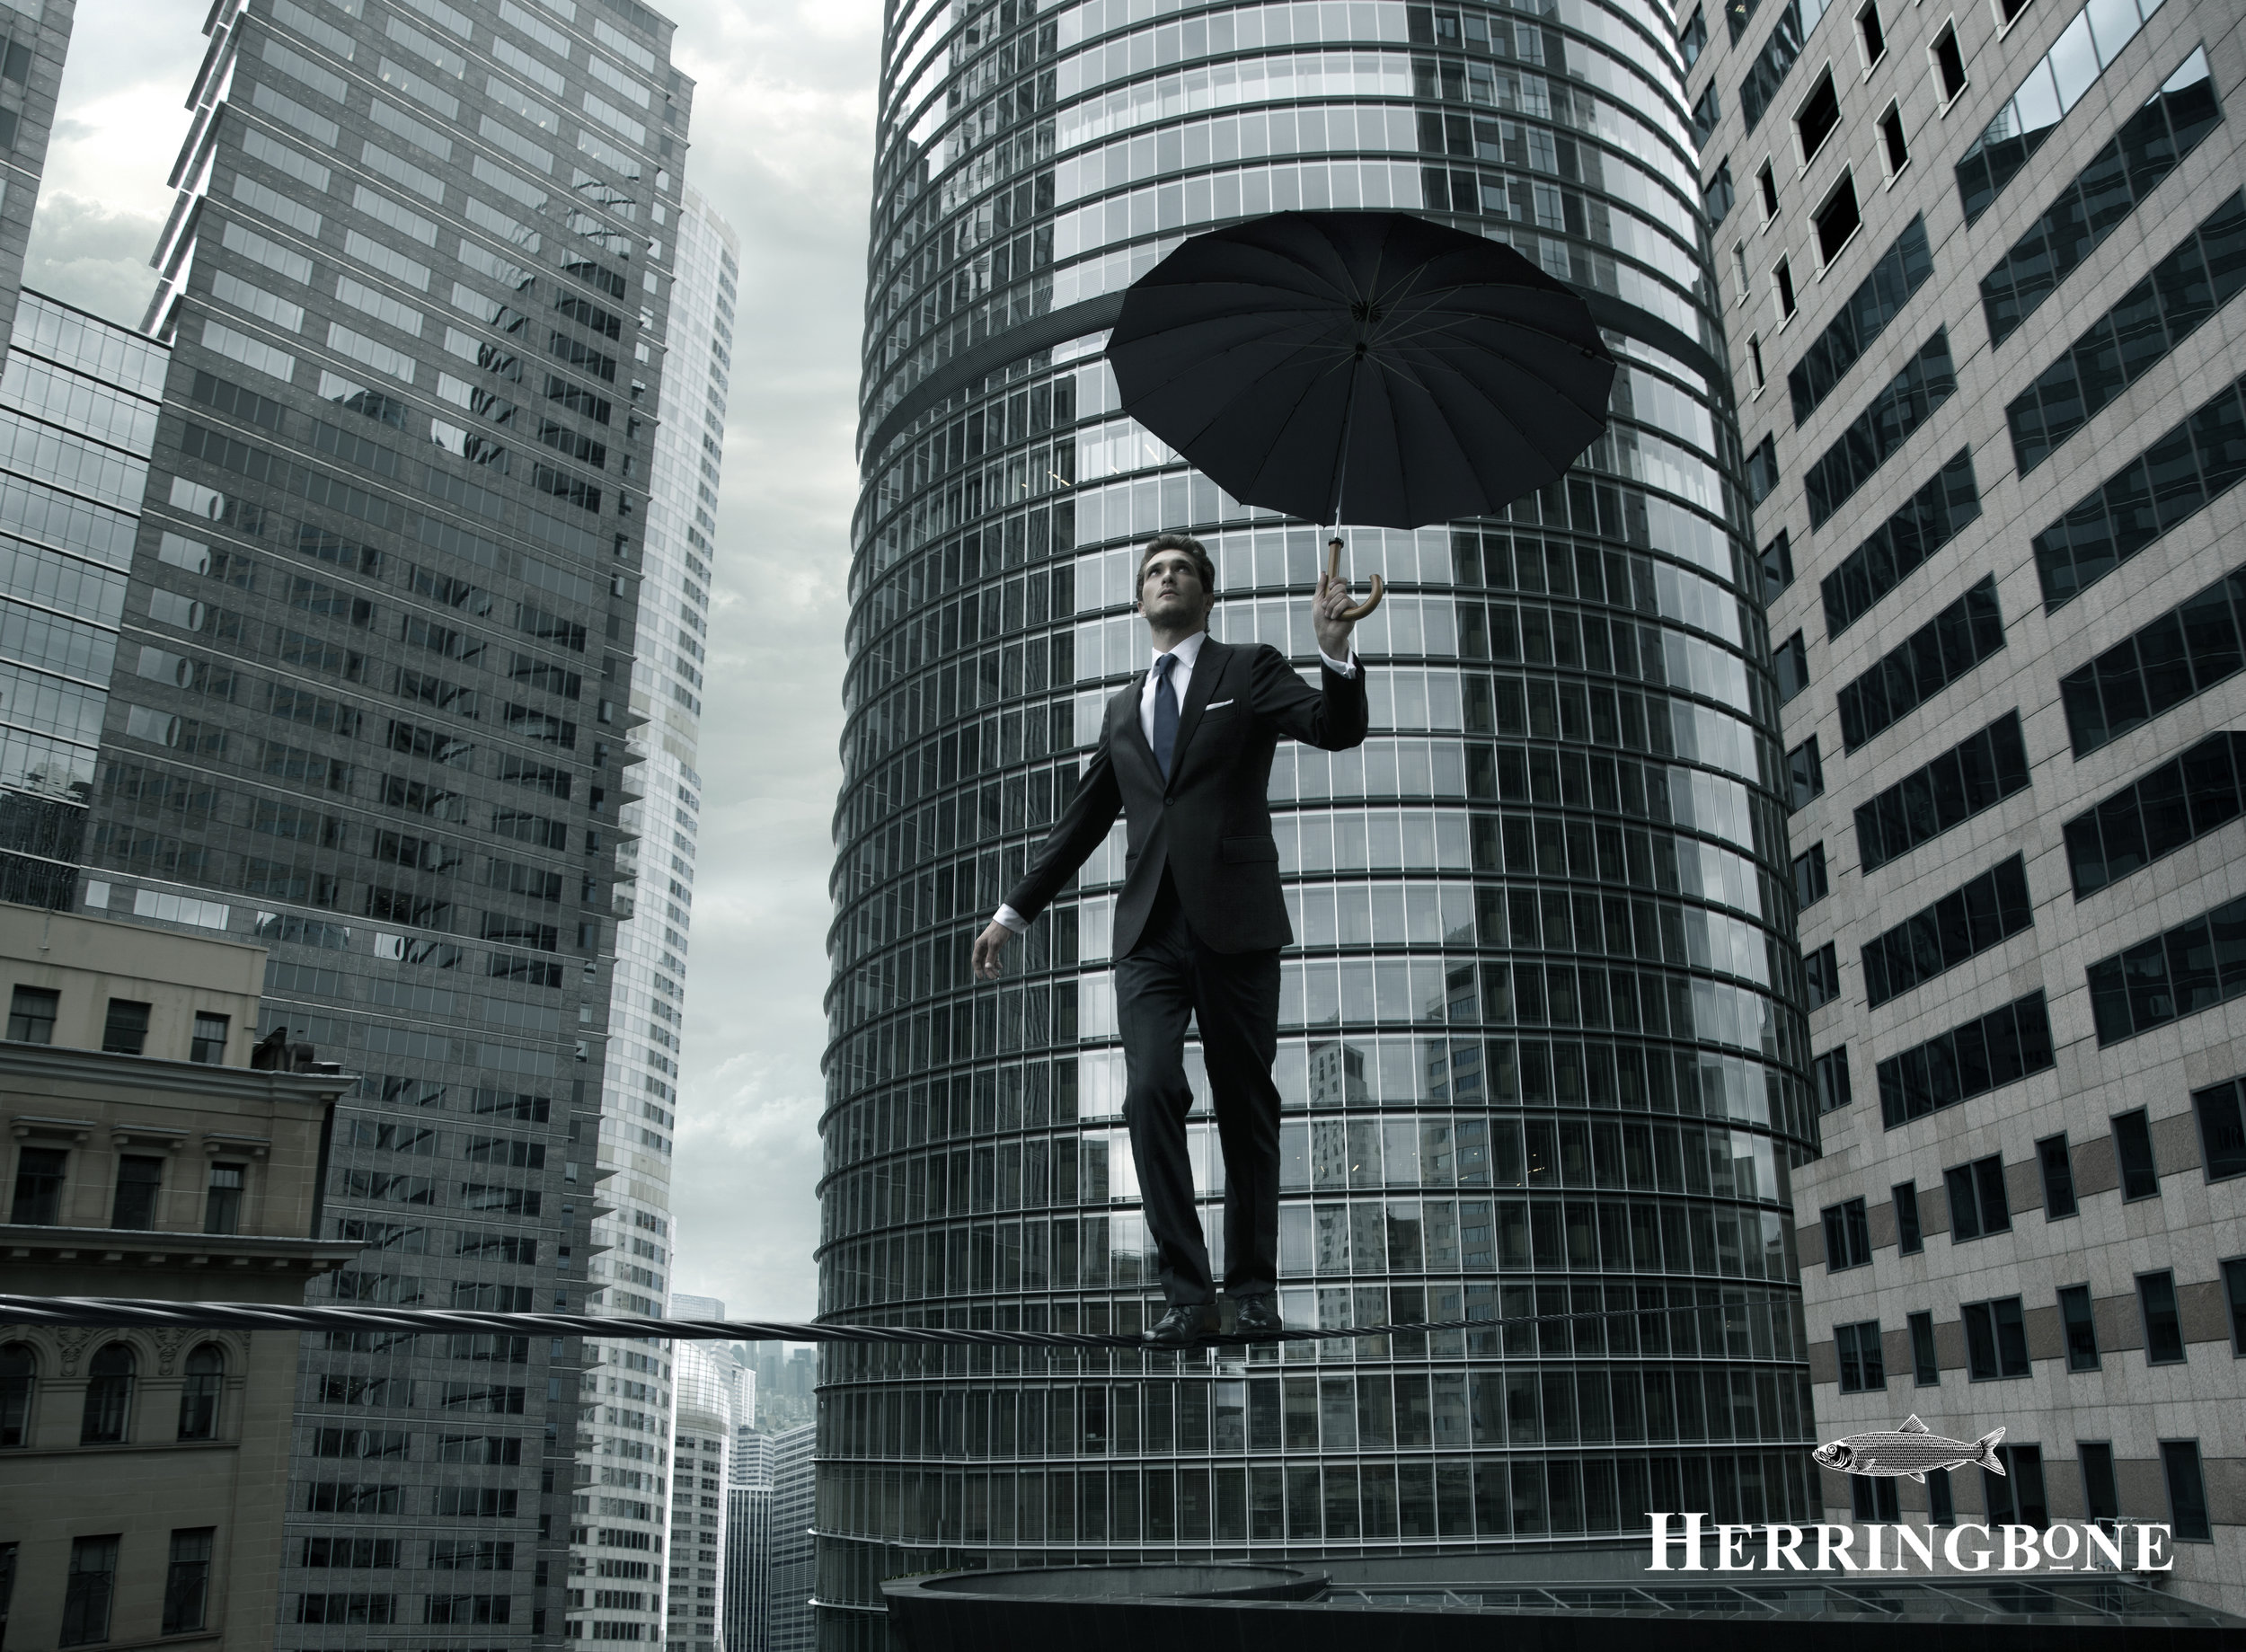 Herringbone_tightrope_PRINT_STILL_final_wlogo.jpg